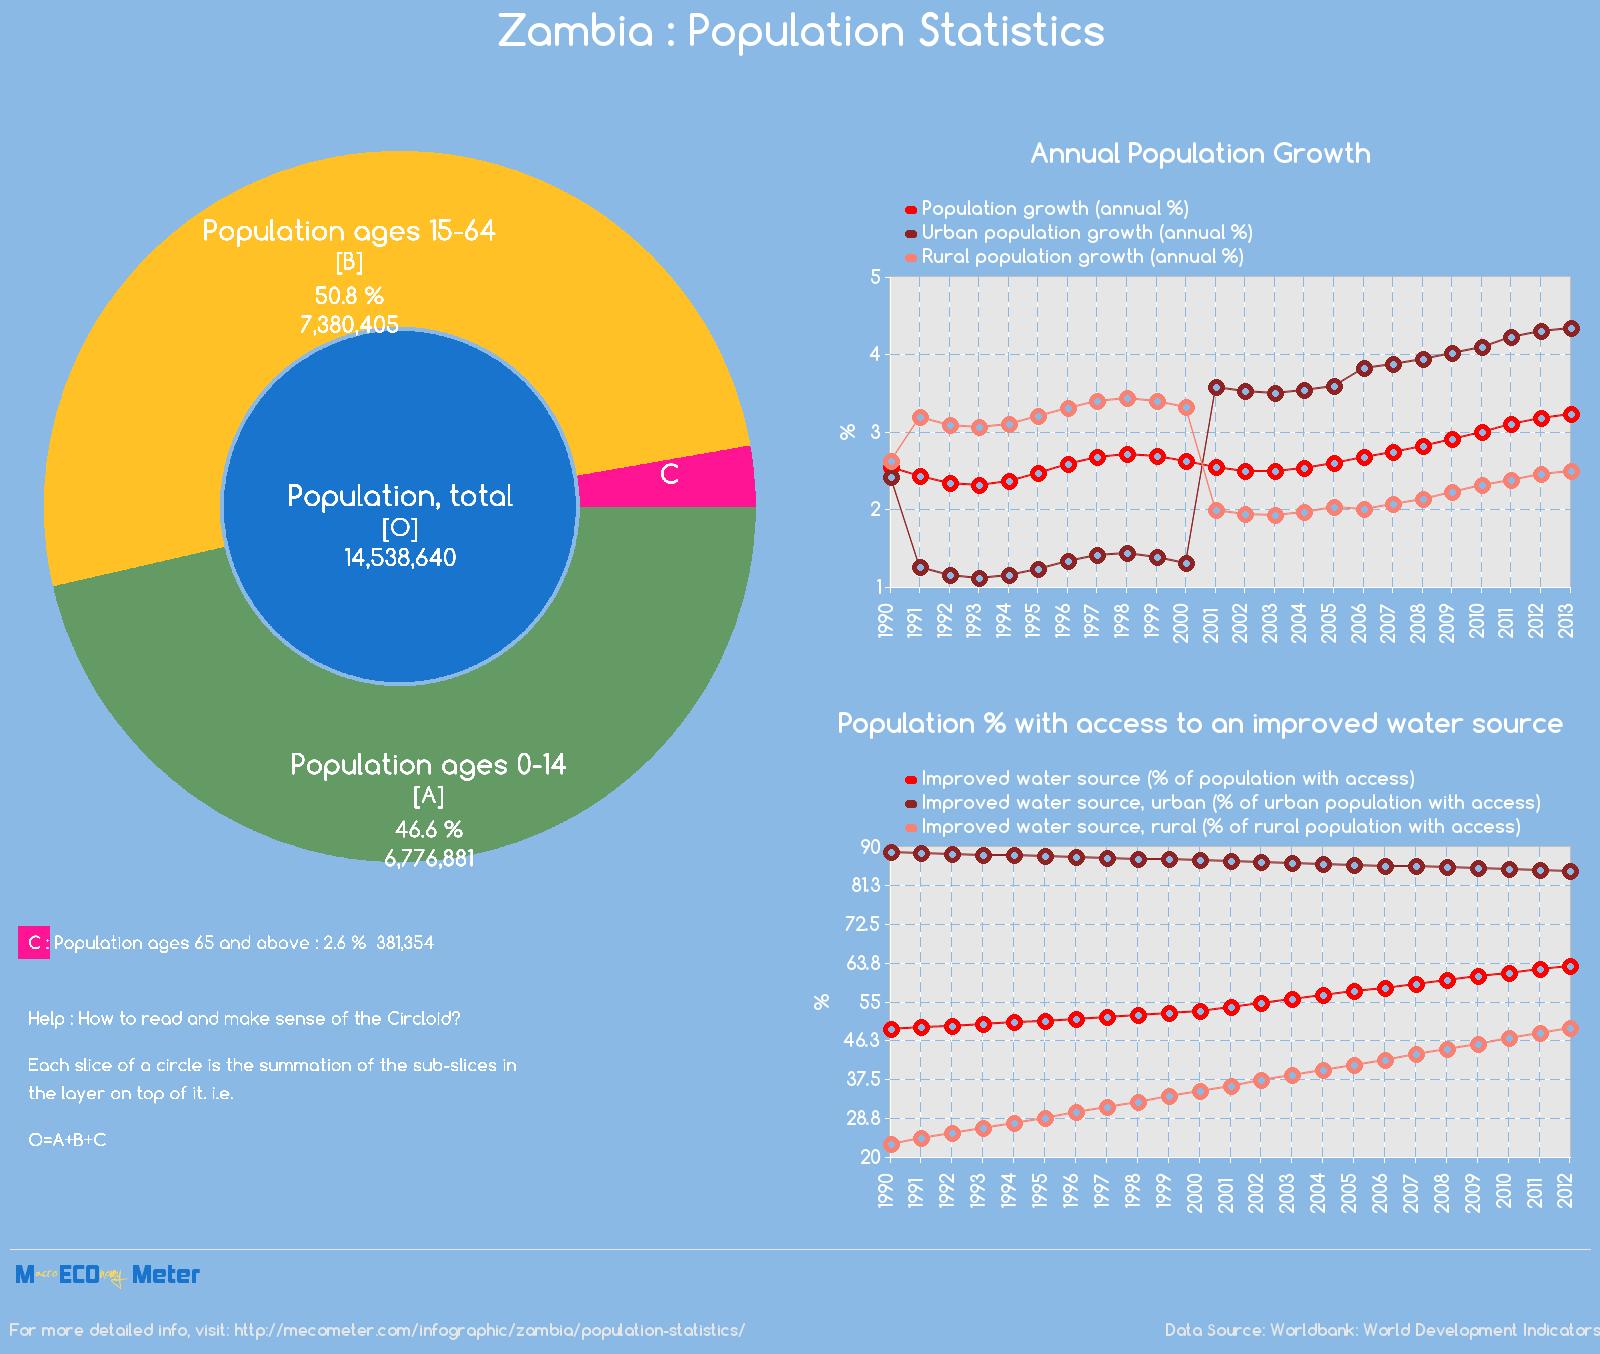 Zambia : Population Statistics